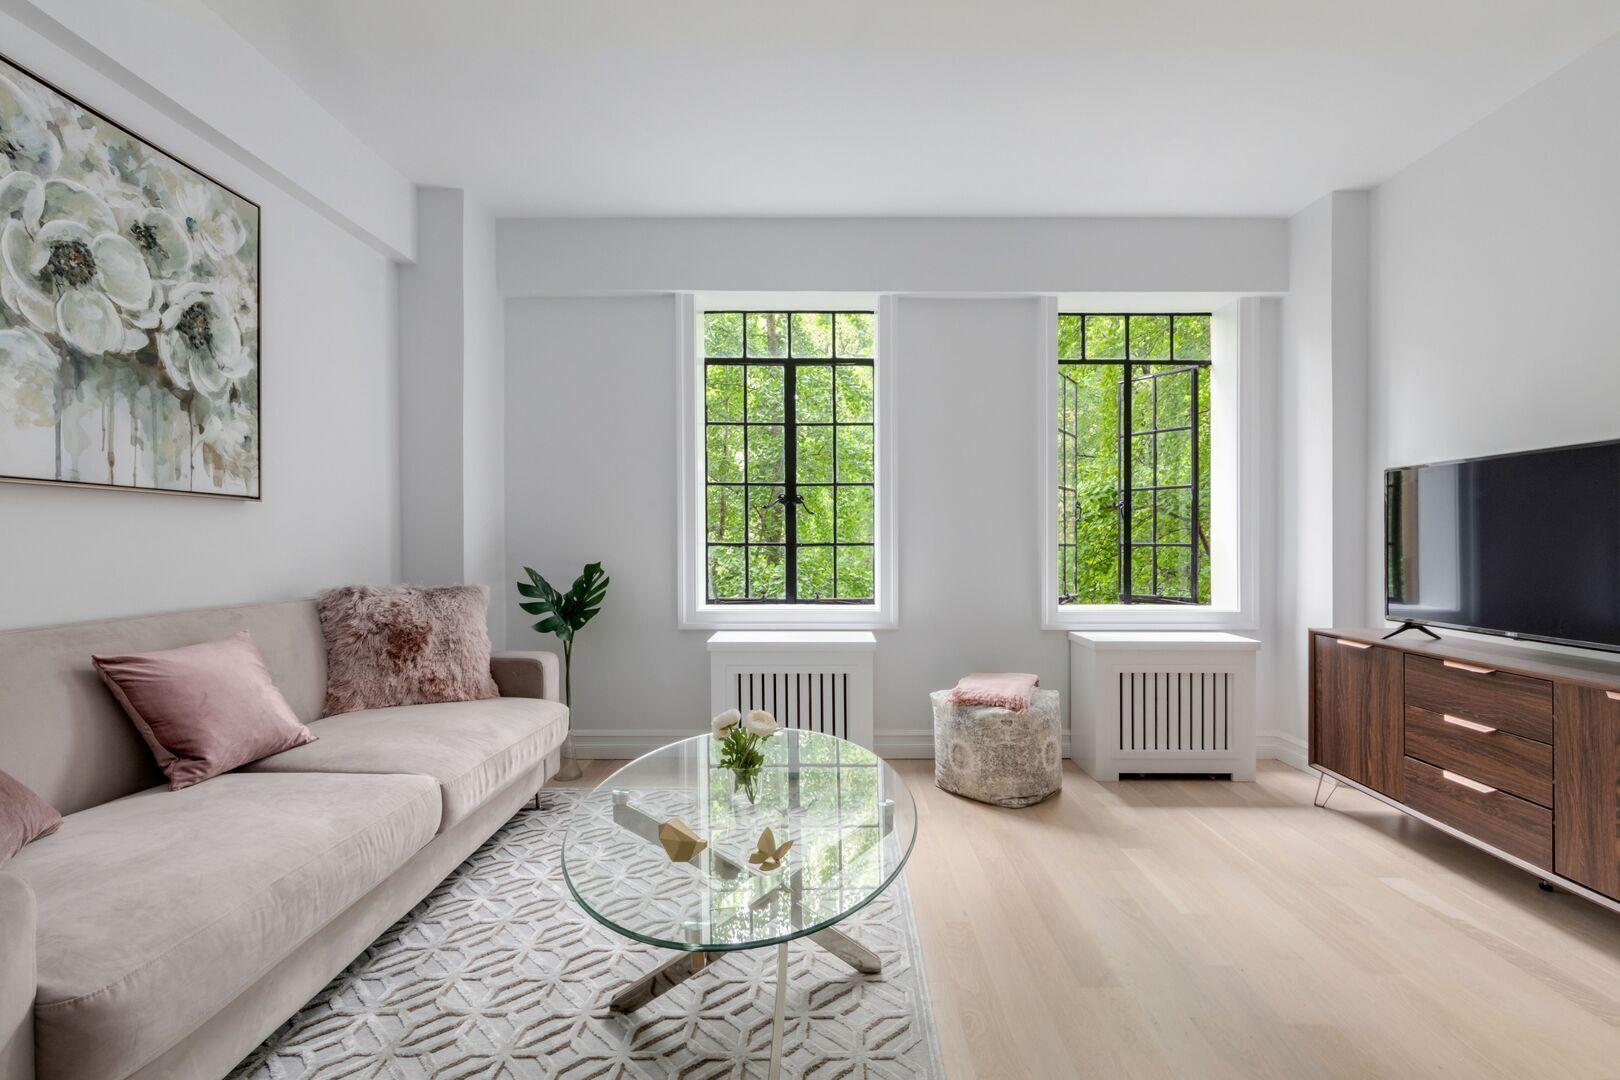 Apartment for sale at 45 Tudor City Place, Apt 318